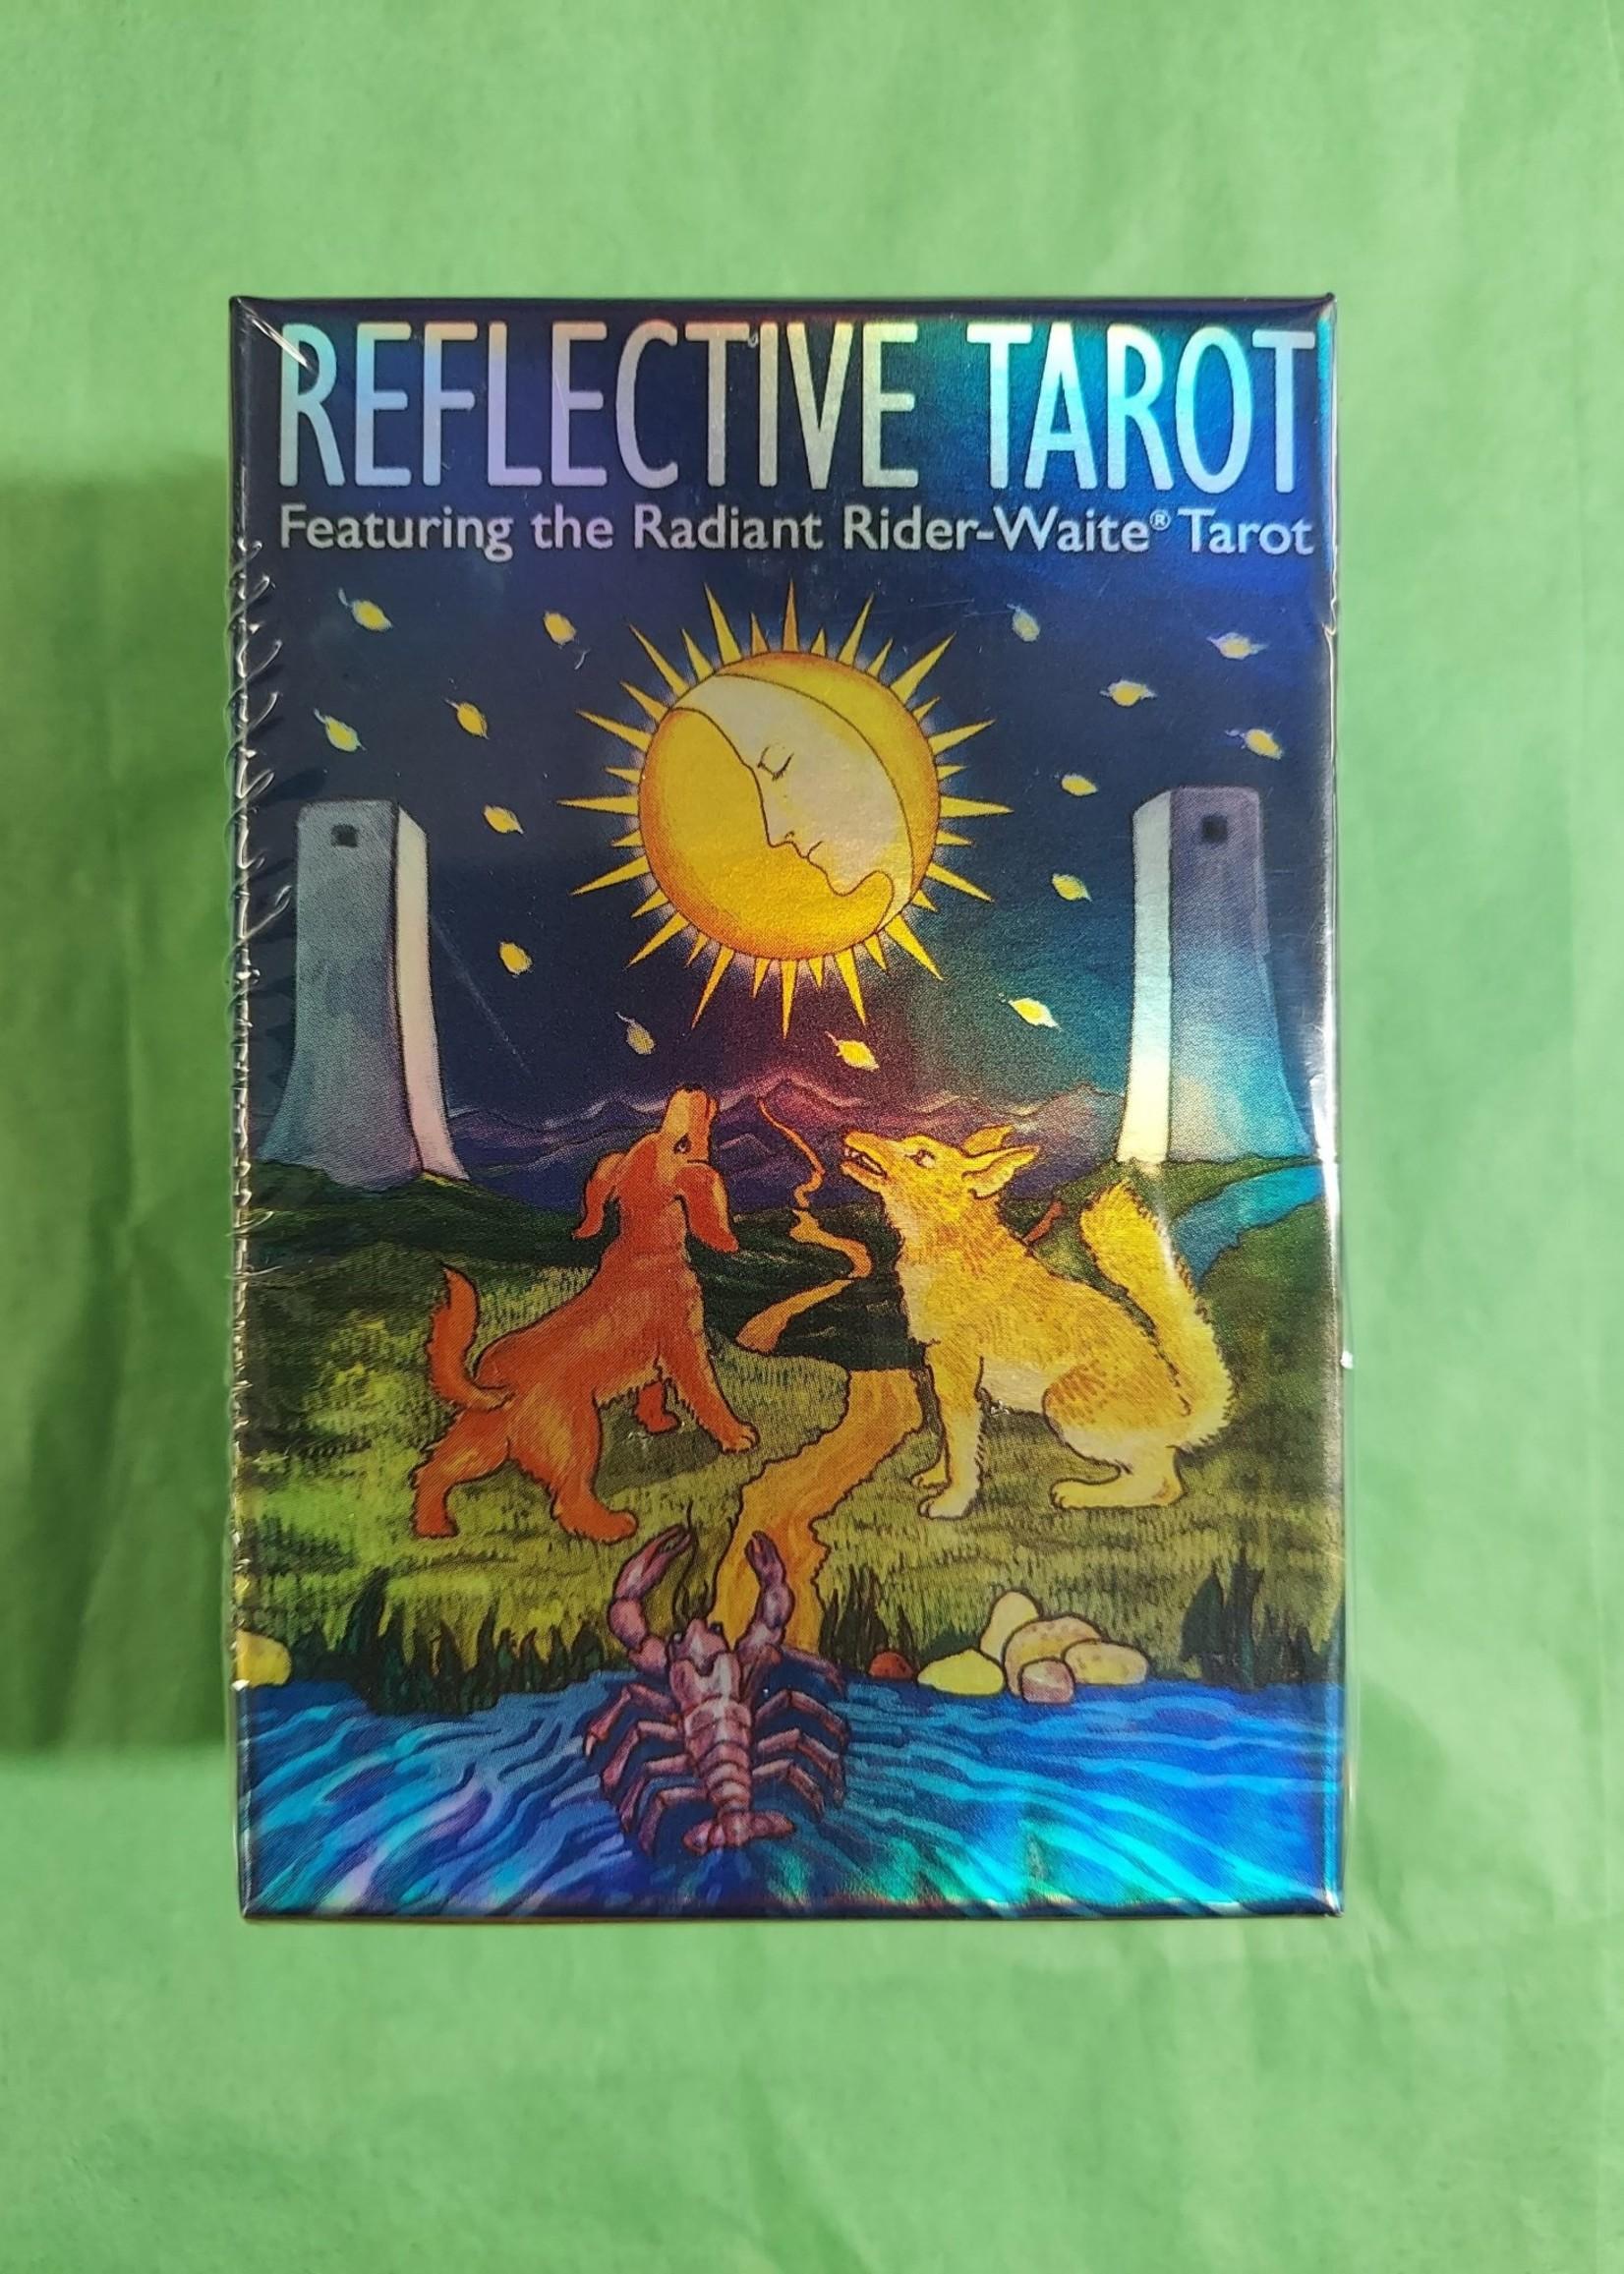 Reflective Tarot